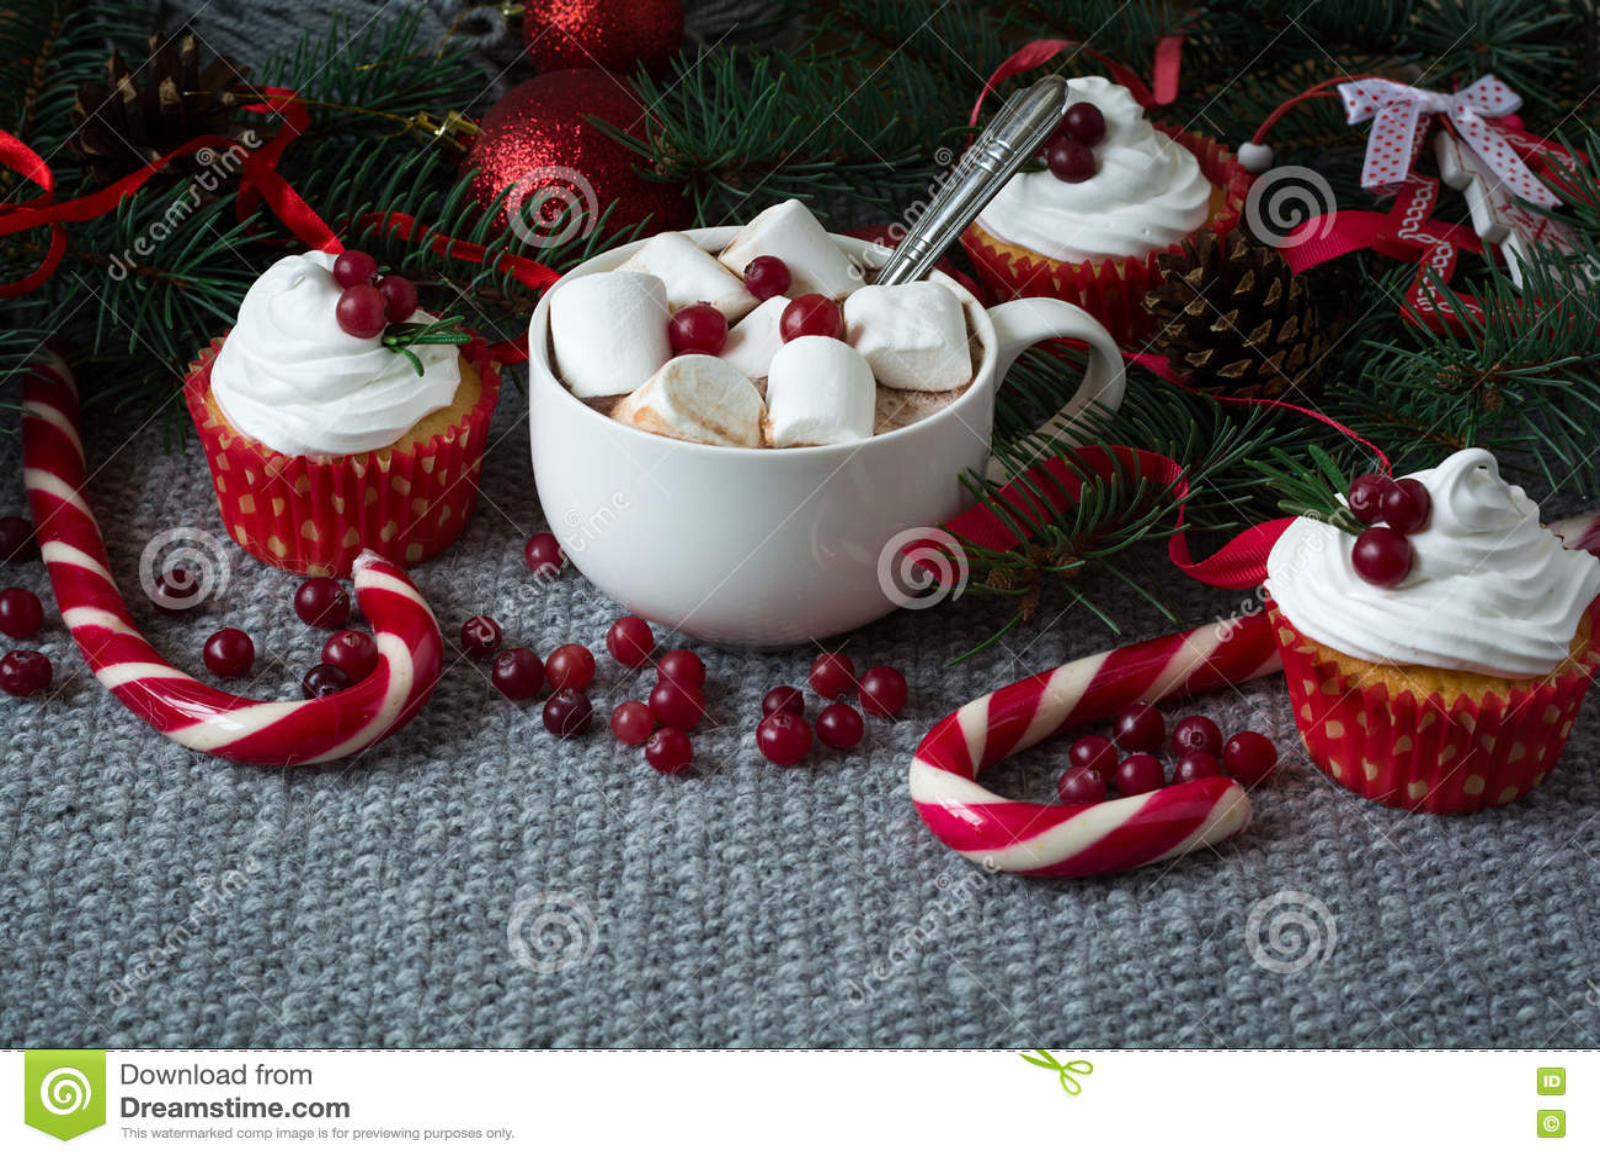 d coration de no l chocolat chaud avec la guimauve photo stock image 80201862. Black Bedroom Furniture Sets. Home Design Ideas